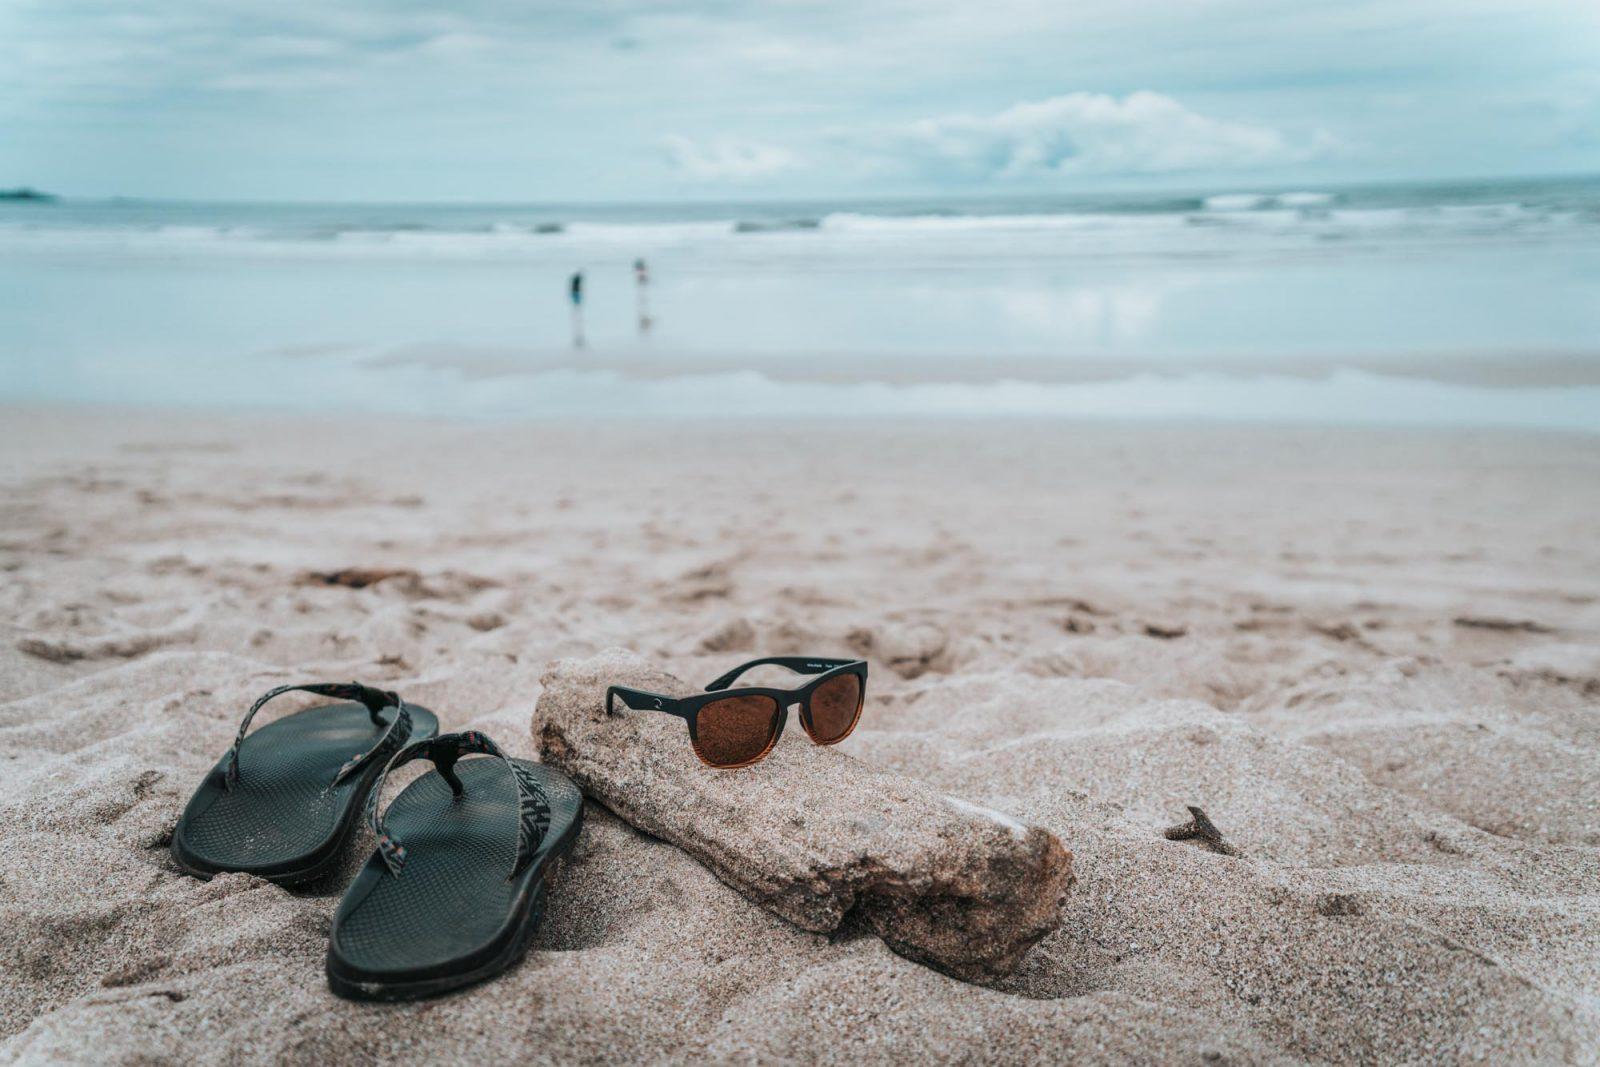 Chao flip flops on the beach